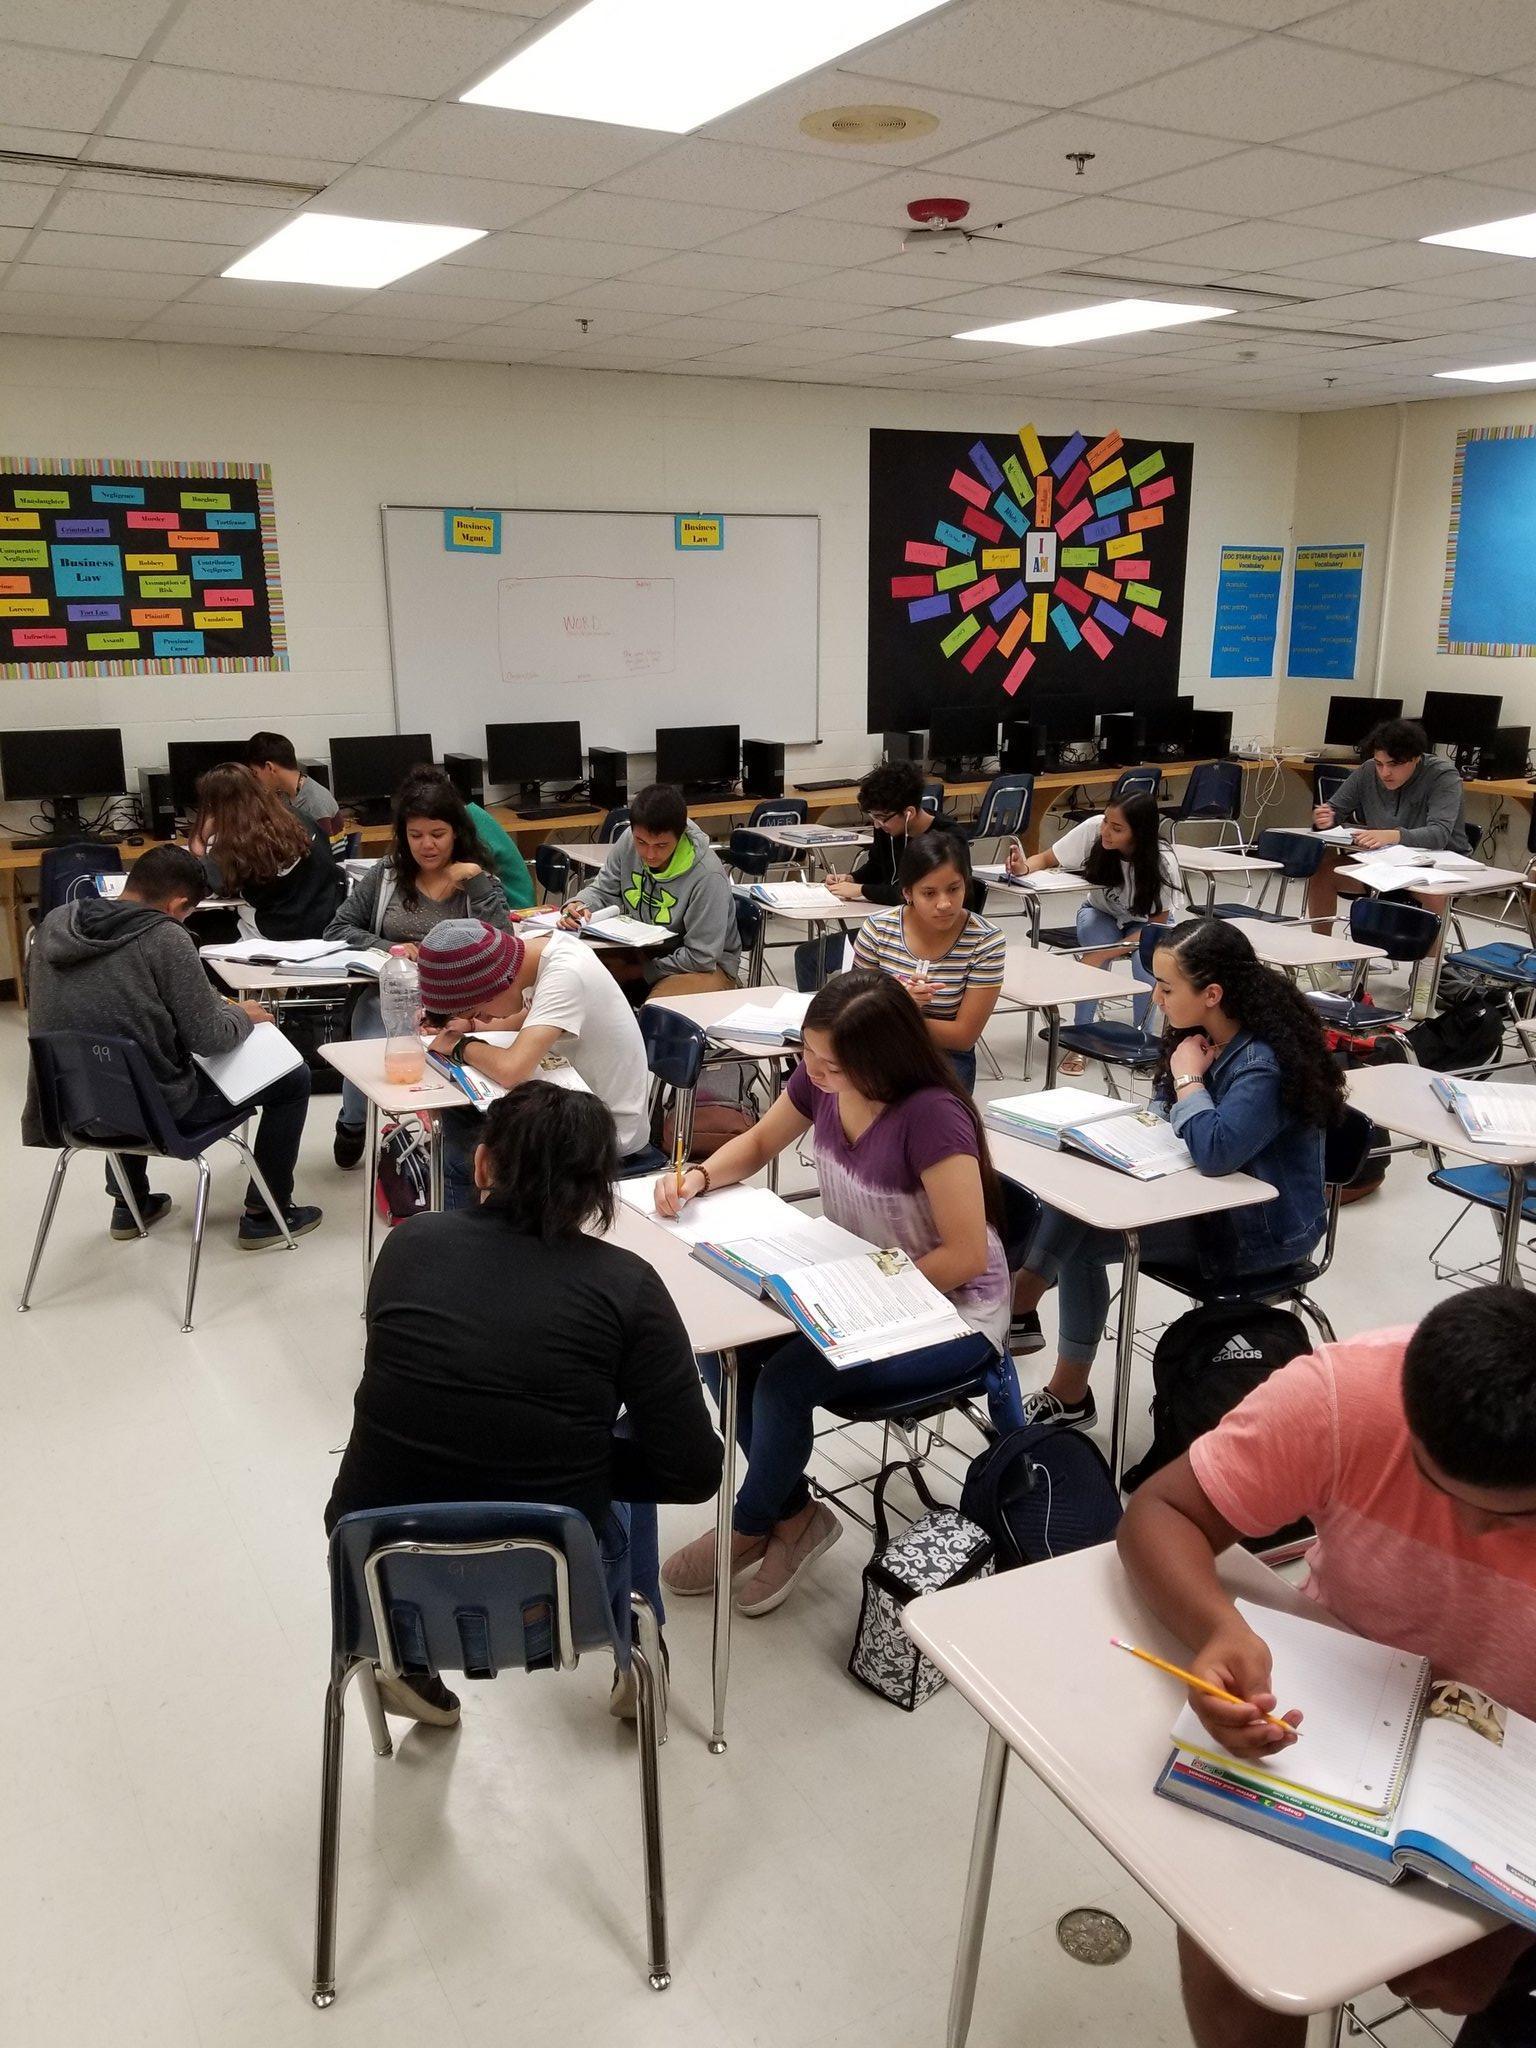 students sitting in desks completing work